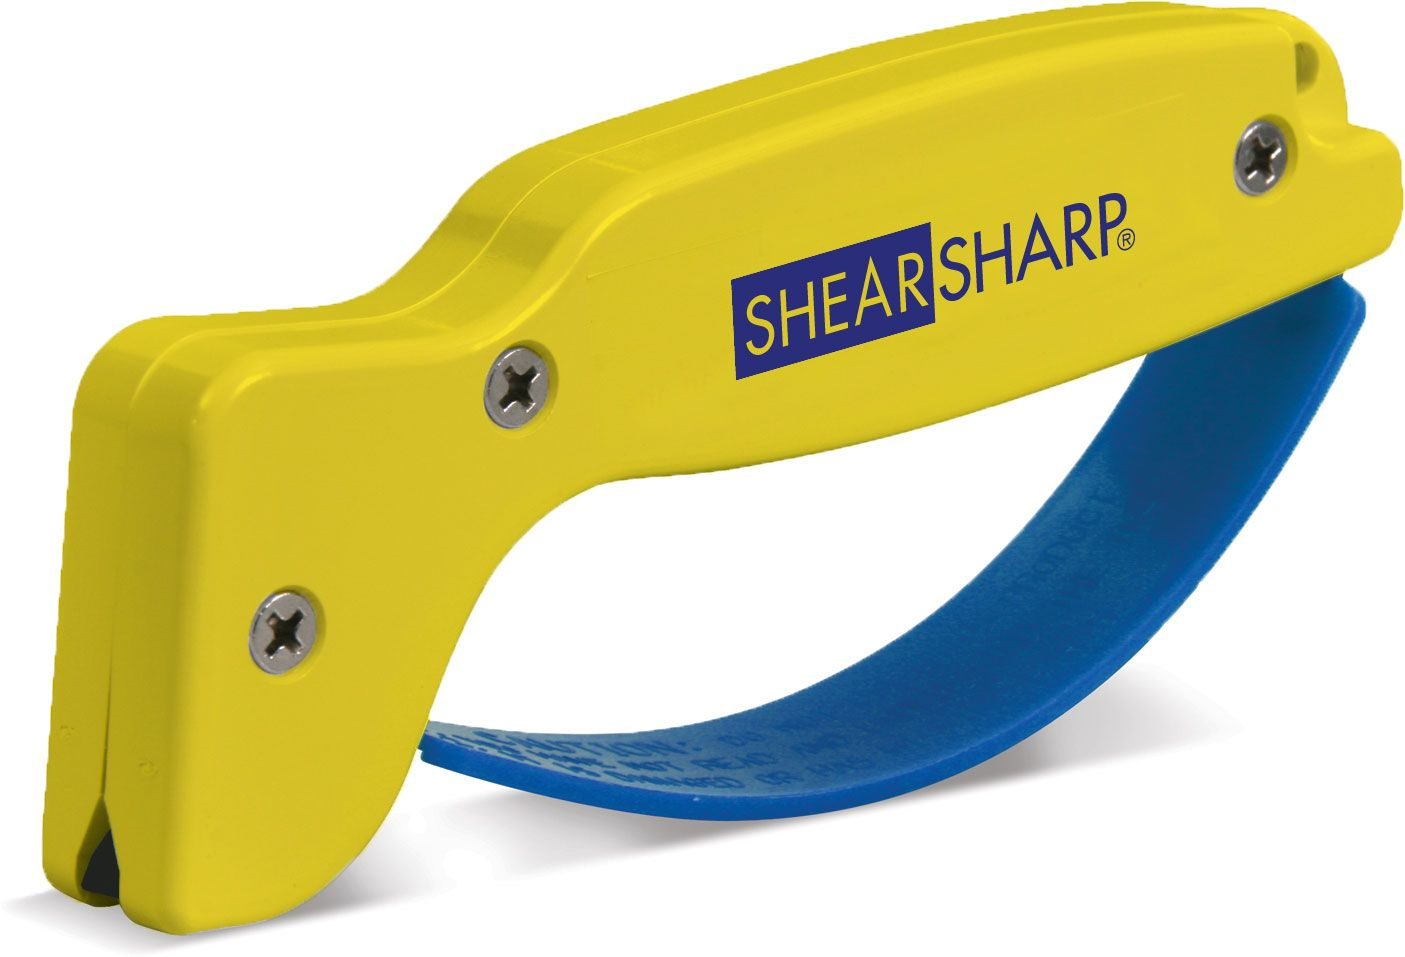 Accusharp 002 V ShearSharp Carbide Scissor Sharpener